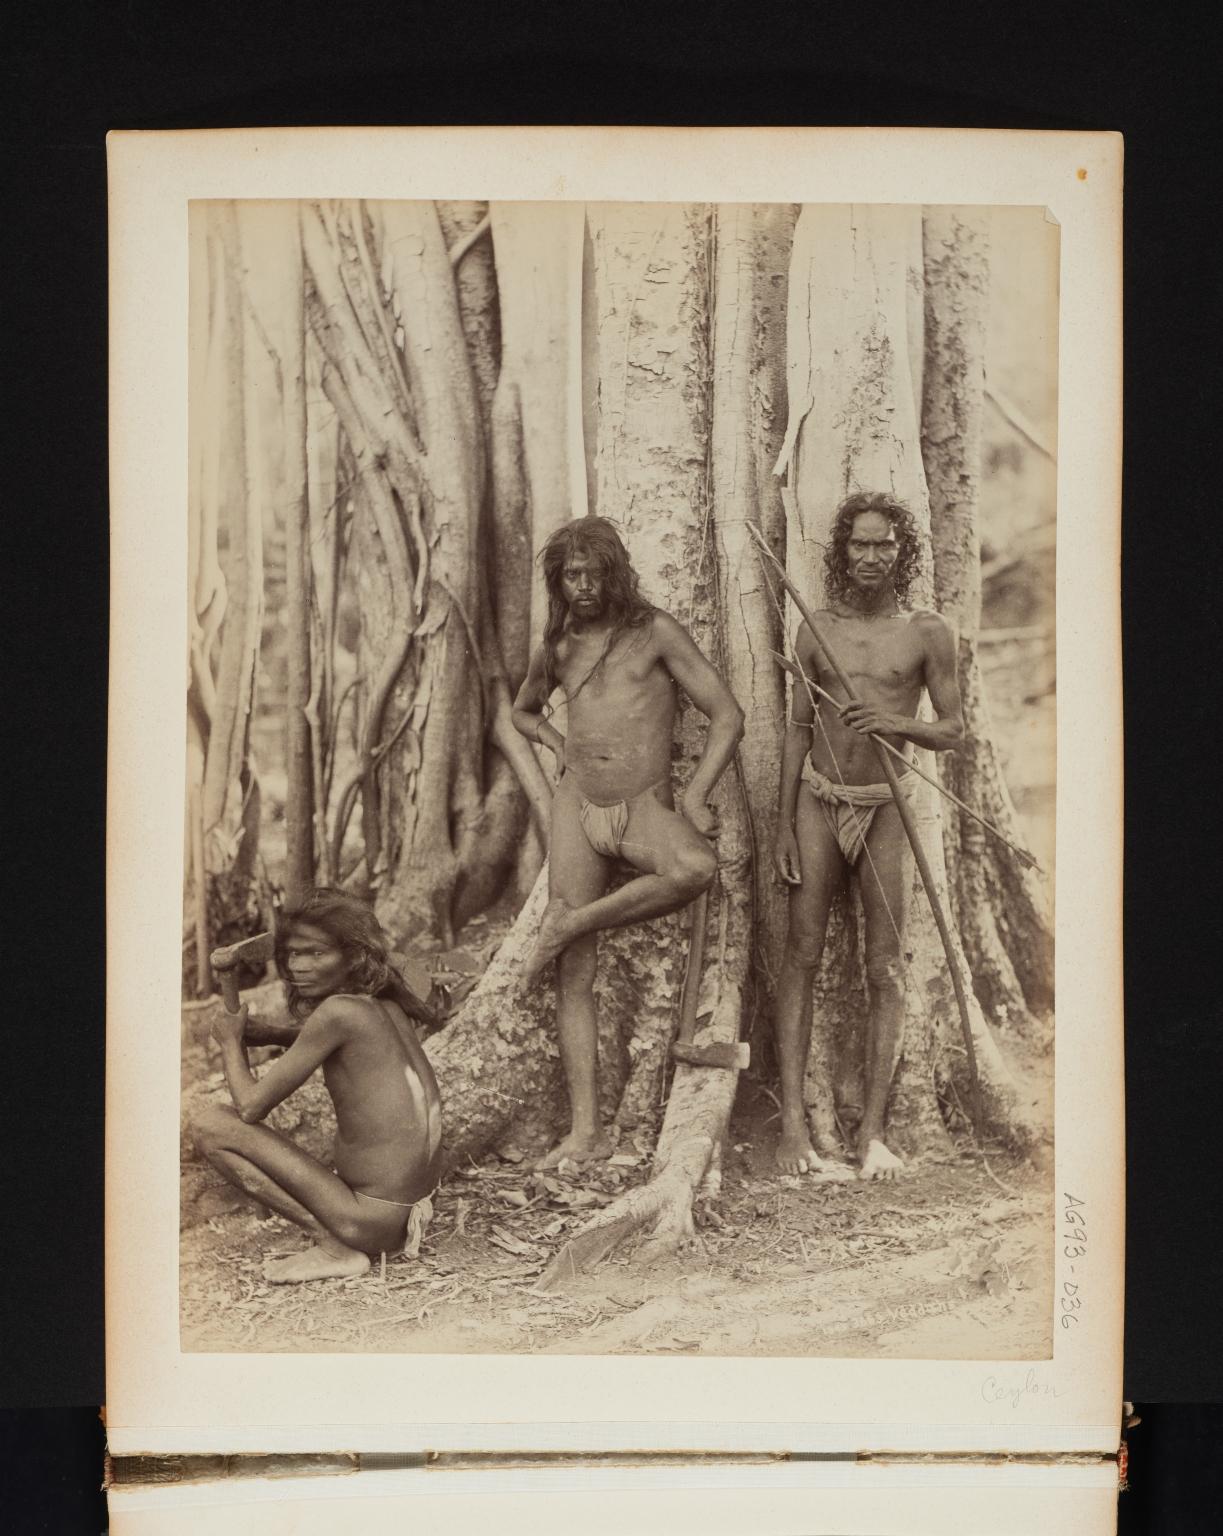 Portrait of three Veddahs, native people in Sri Lanka.